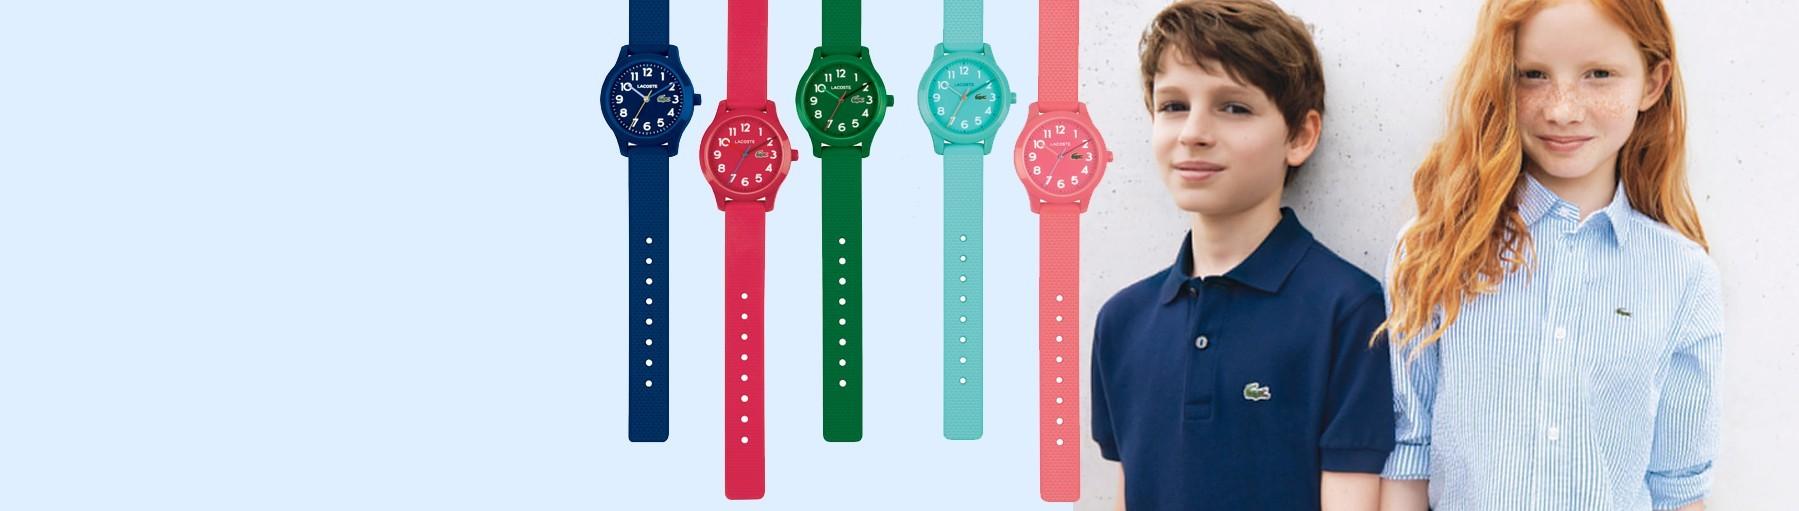 lacoste relojes niños